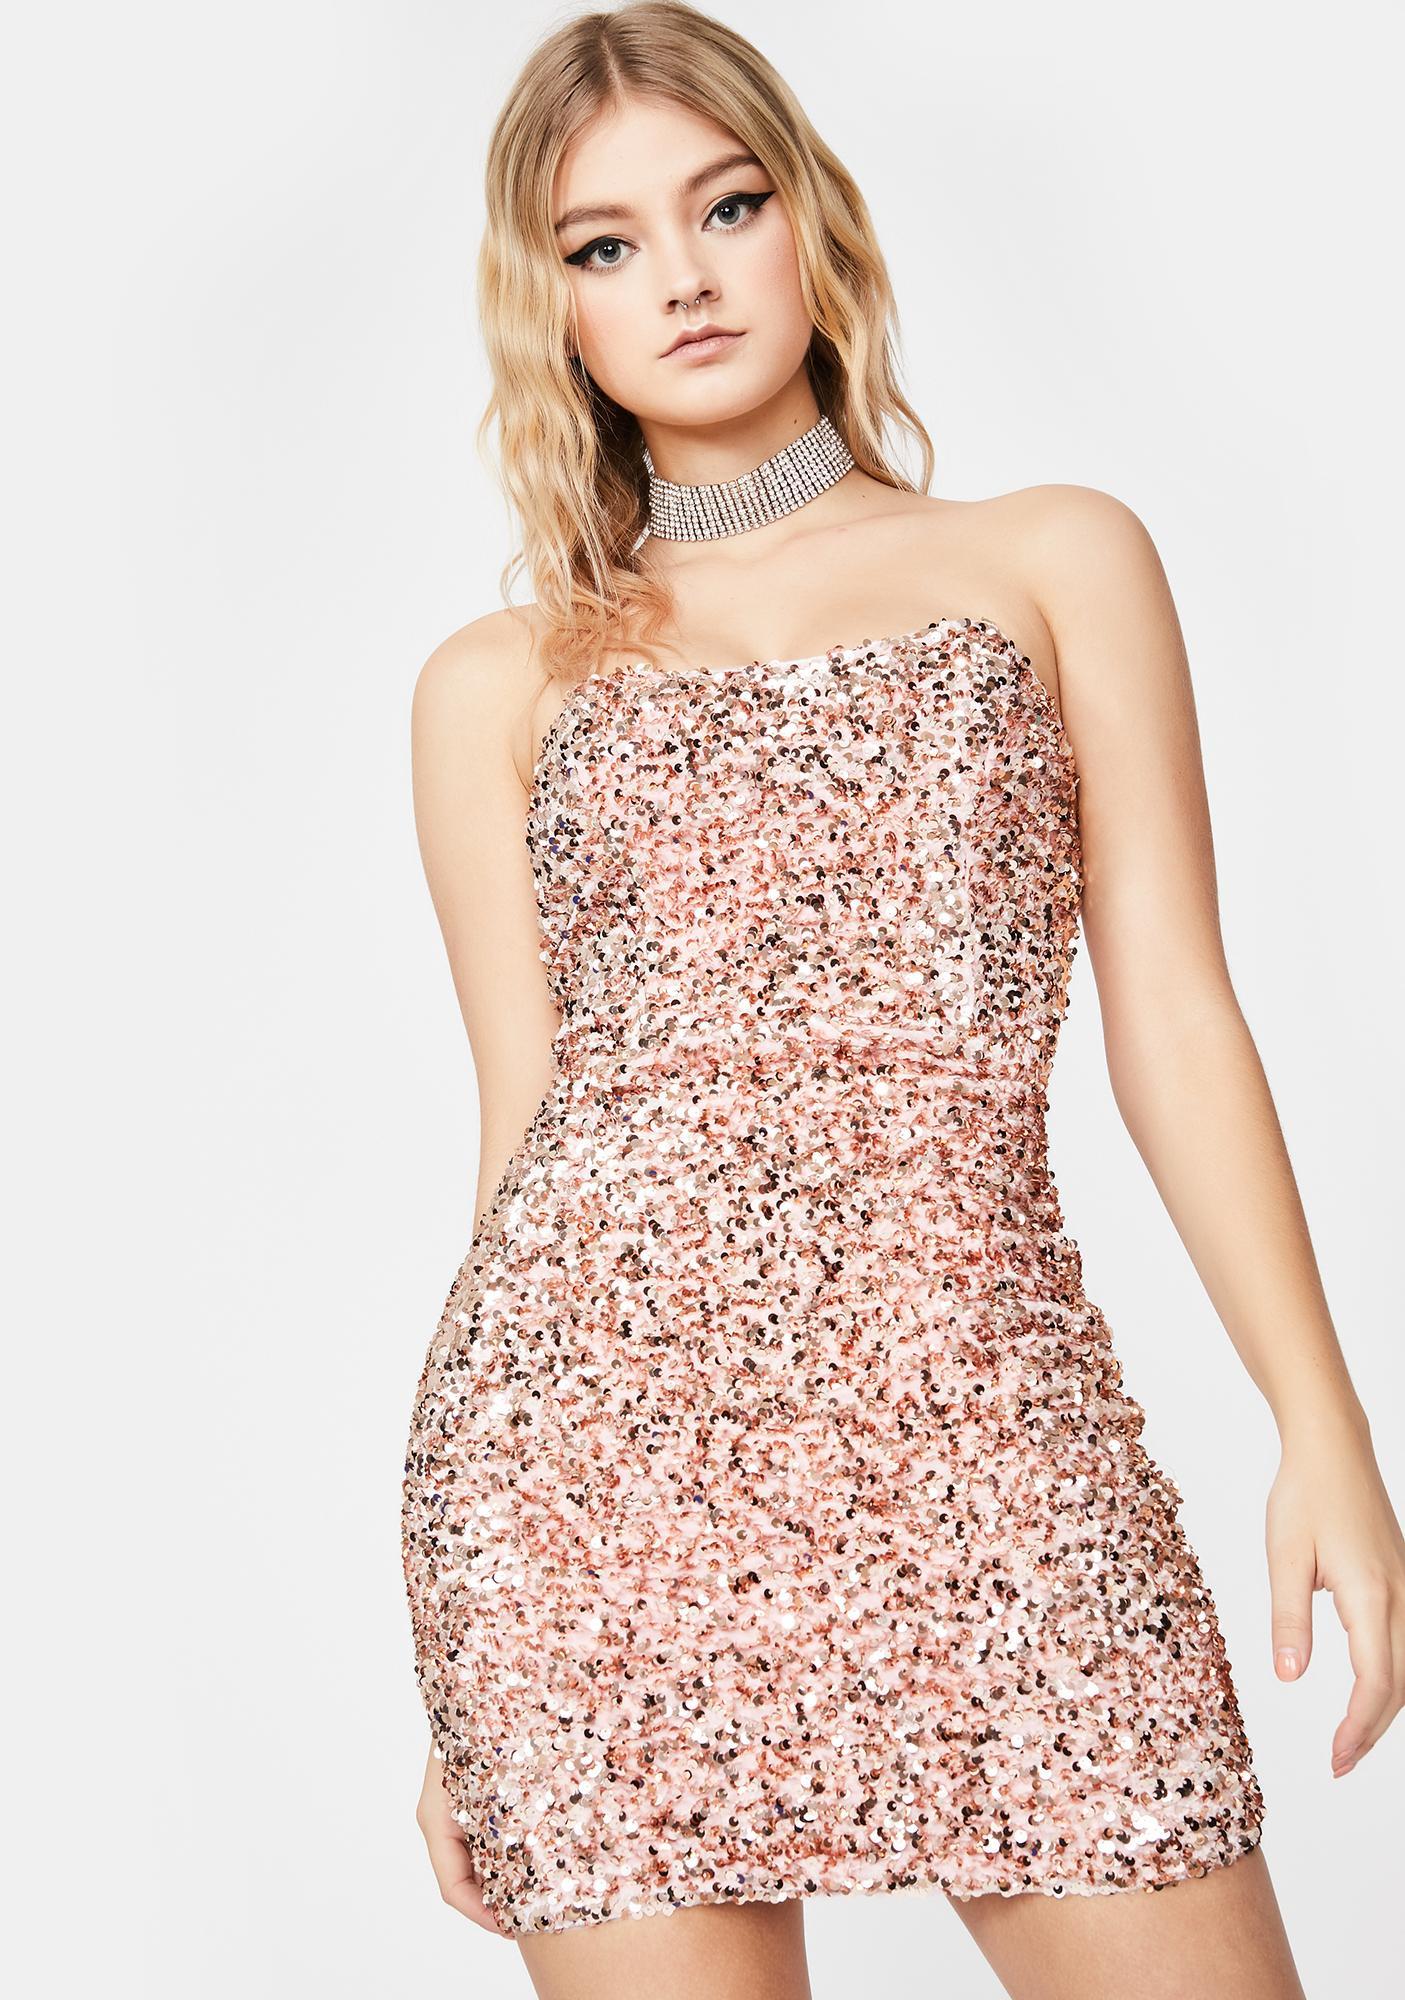 Sequin Tube Mini Dress Bodycon Strapless Pink Rose Gold Dolls Kill